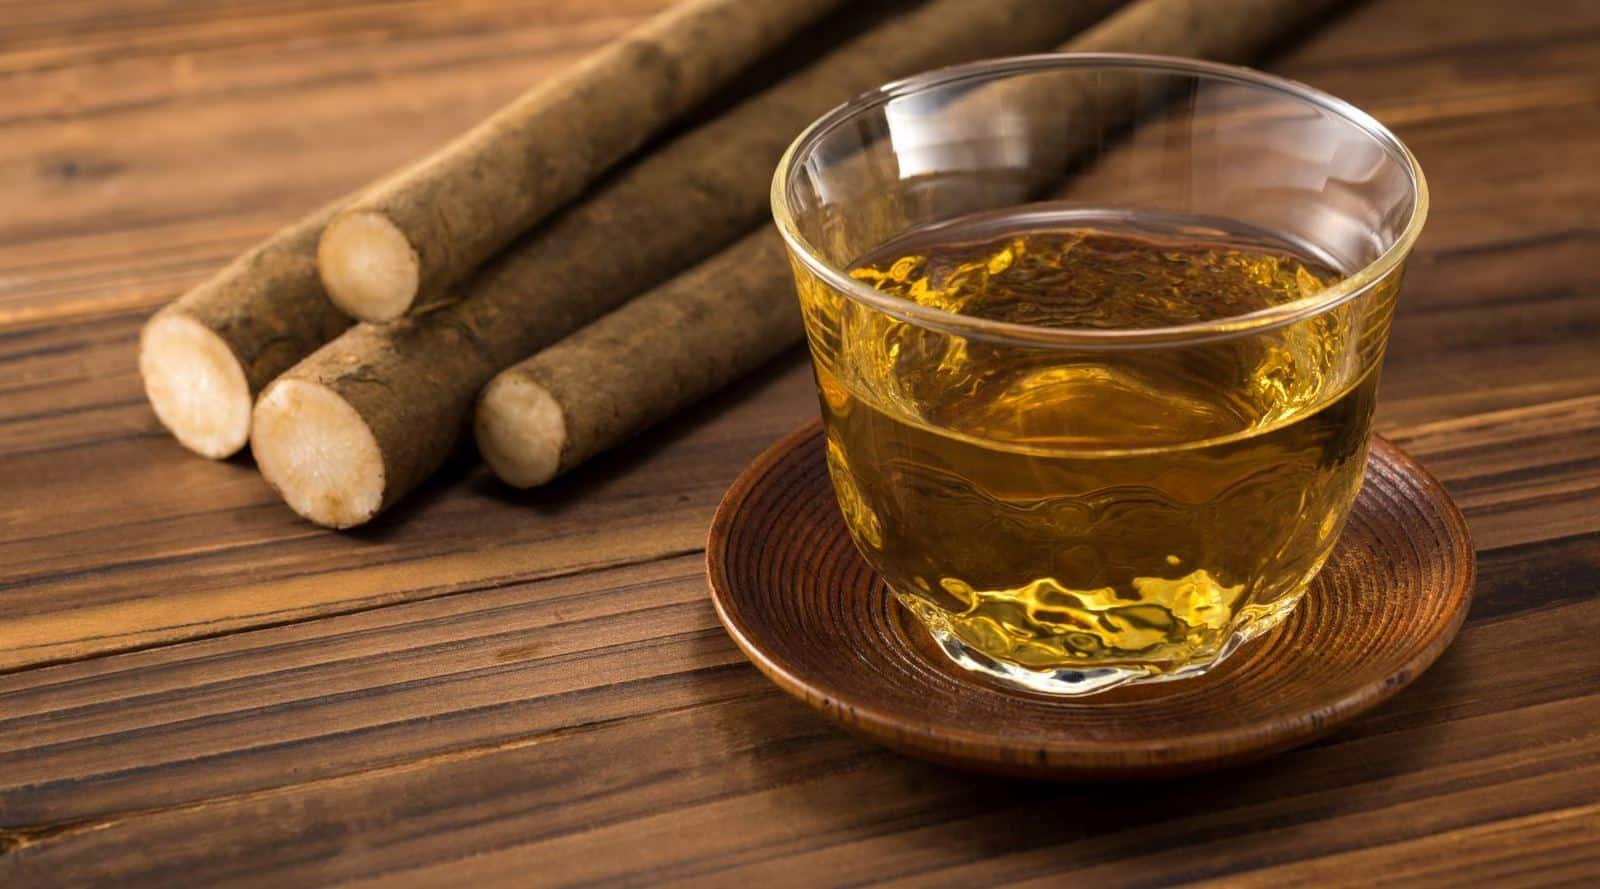 8 health benefits of burdock tea you should know